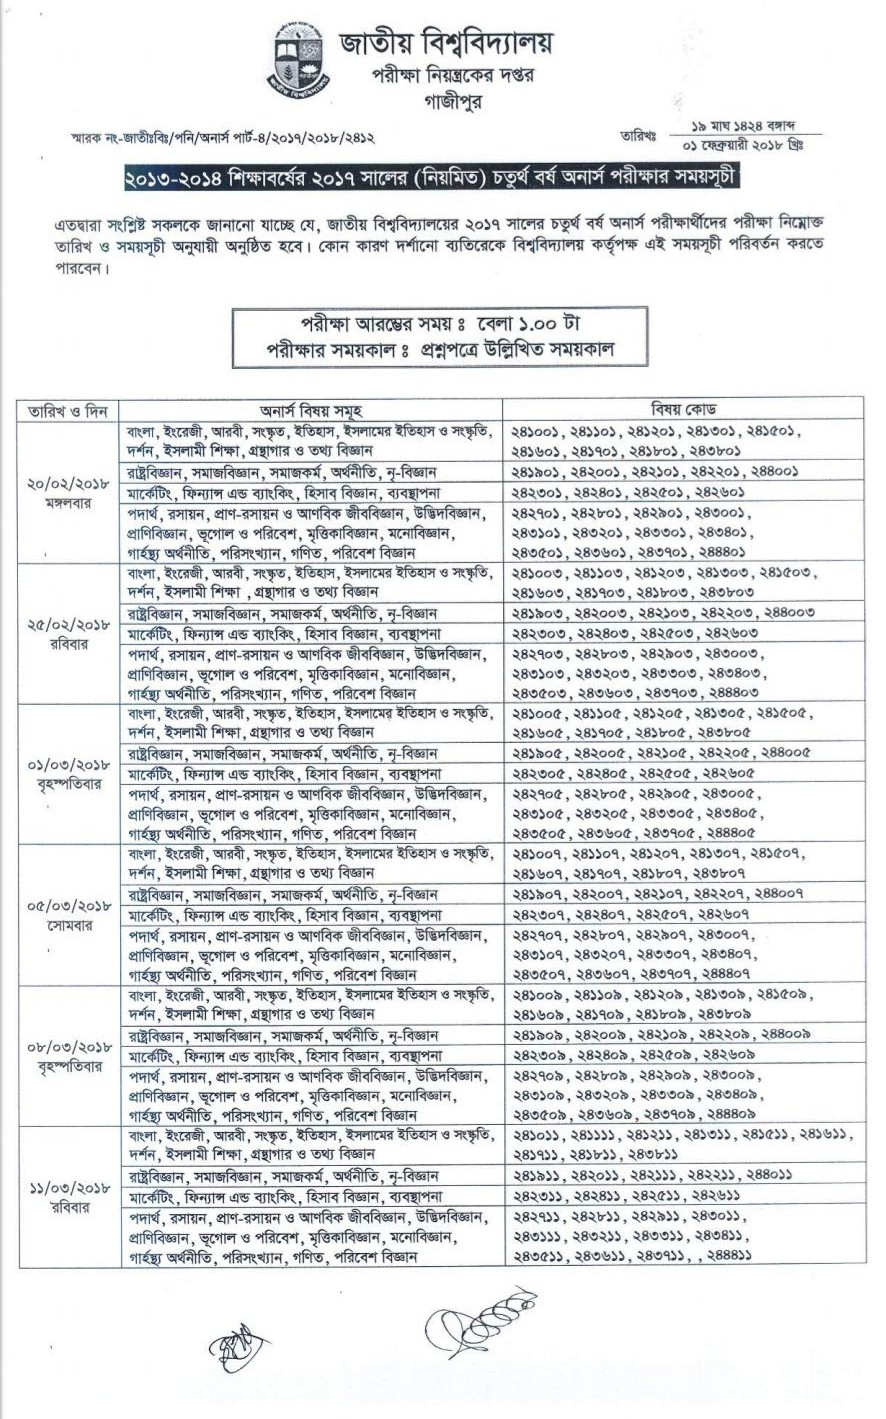 Honours 4th year routine. National University Bangladesh